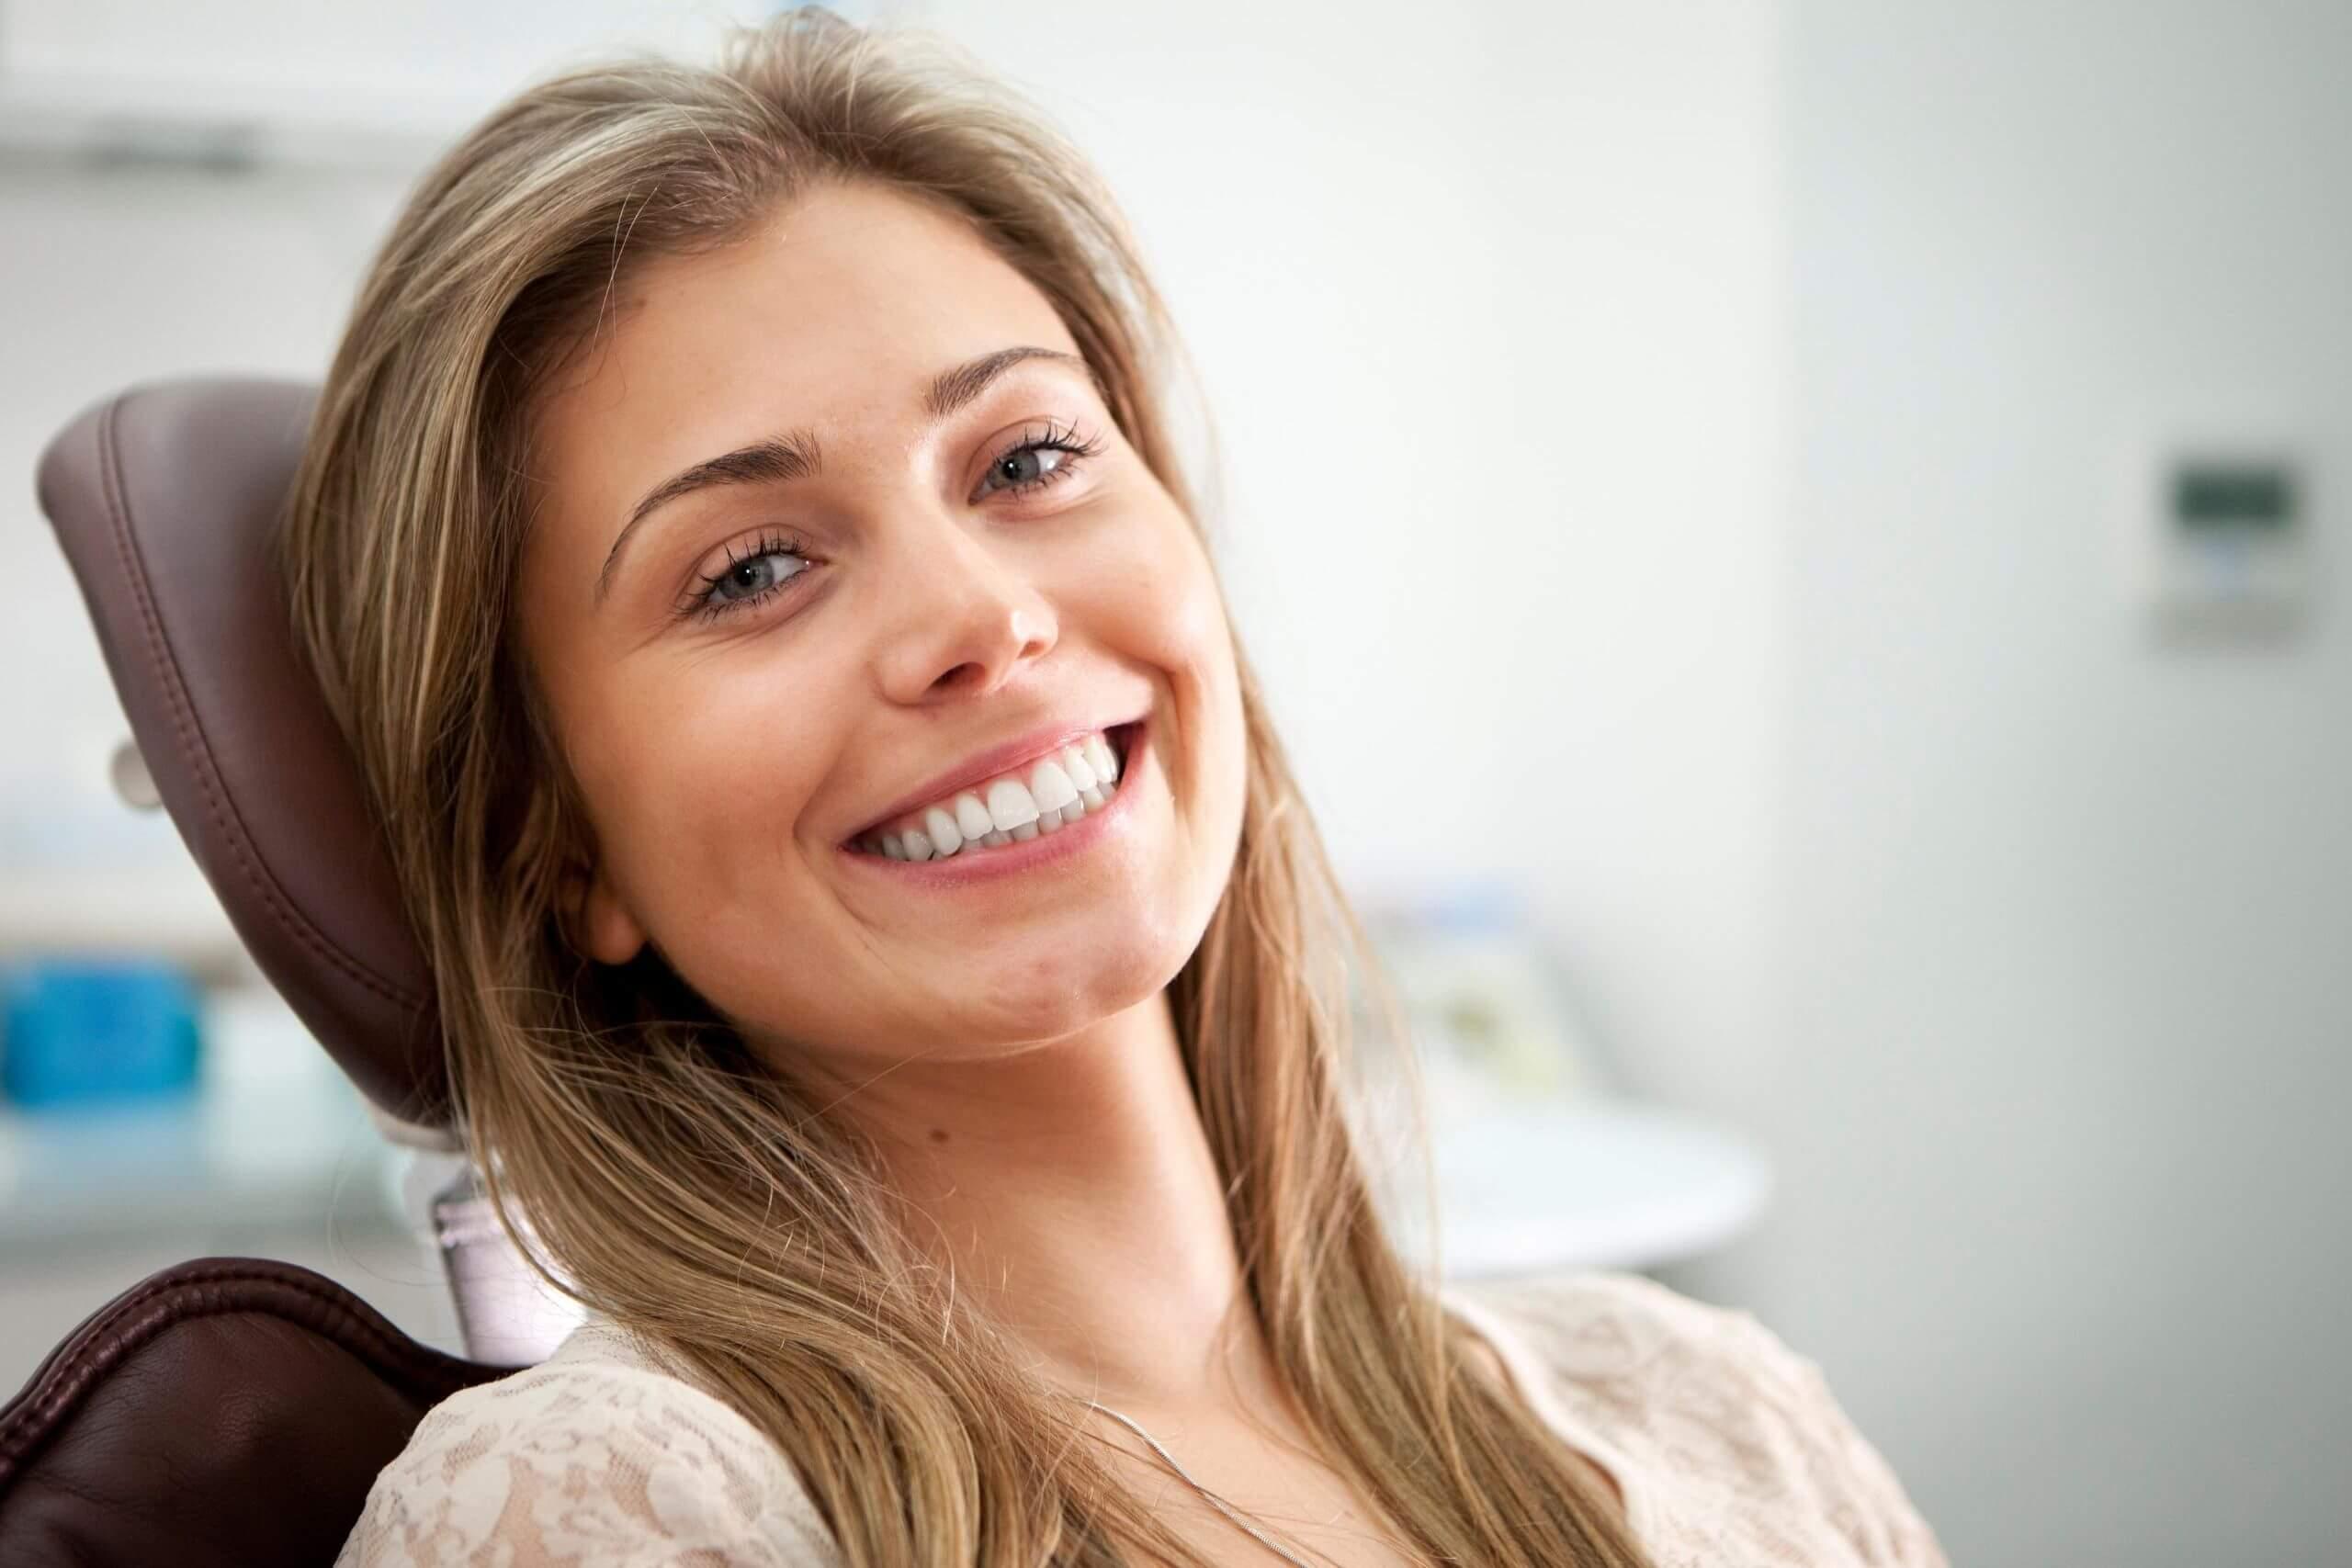 Women in dentist chair smiling